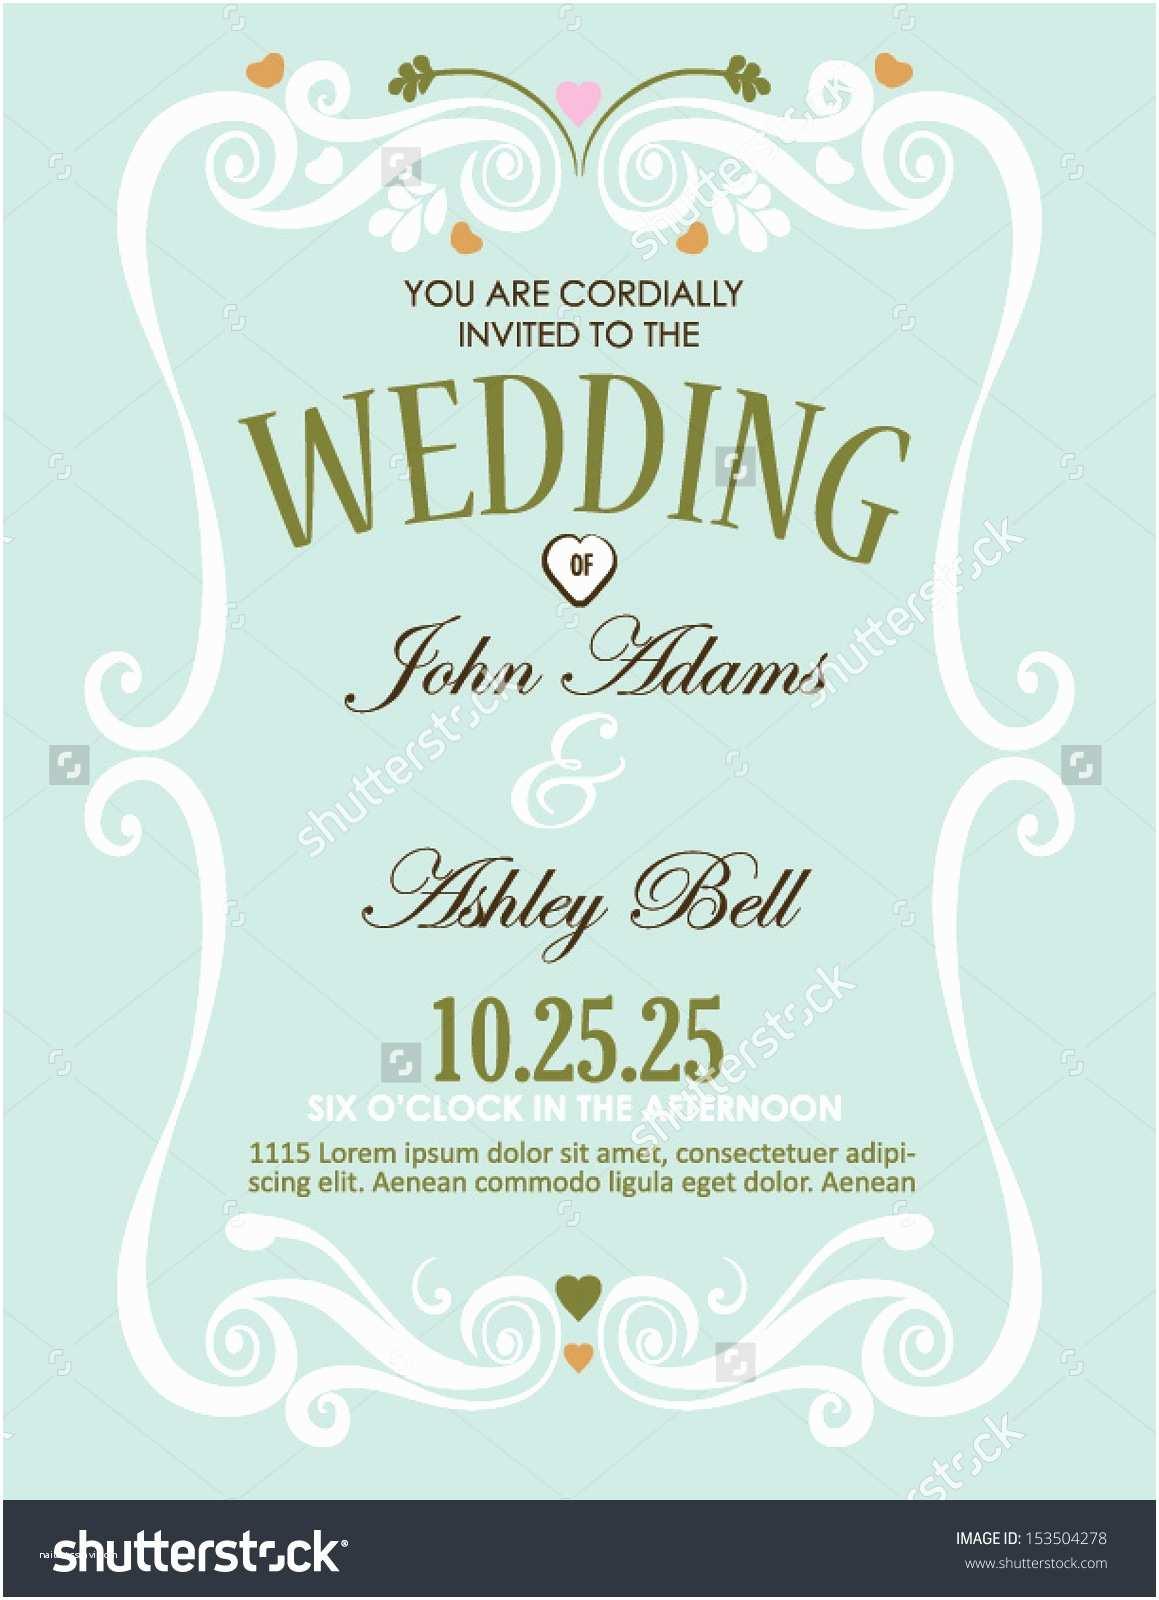 Wedding Invitation Design Images Wedding Invitation Card